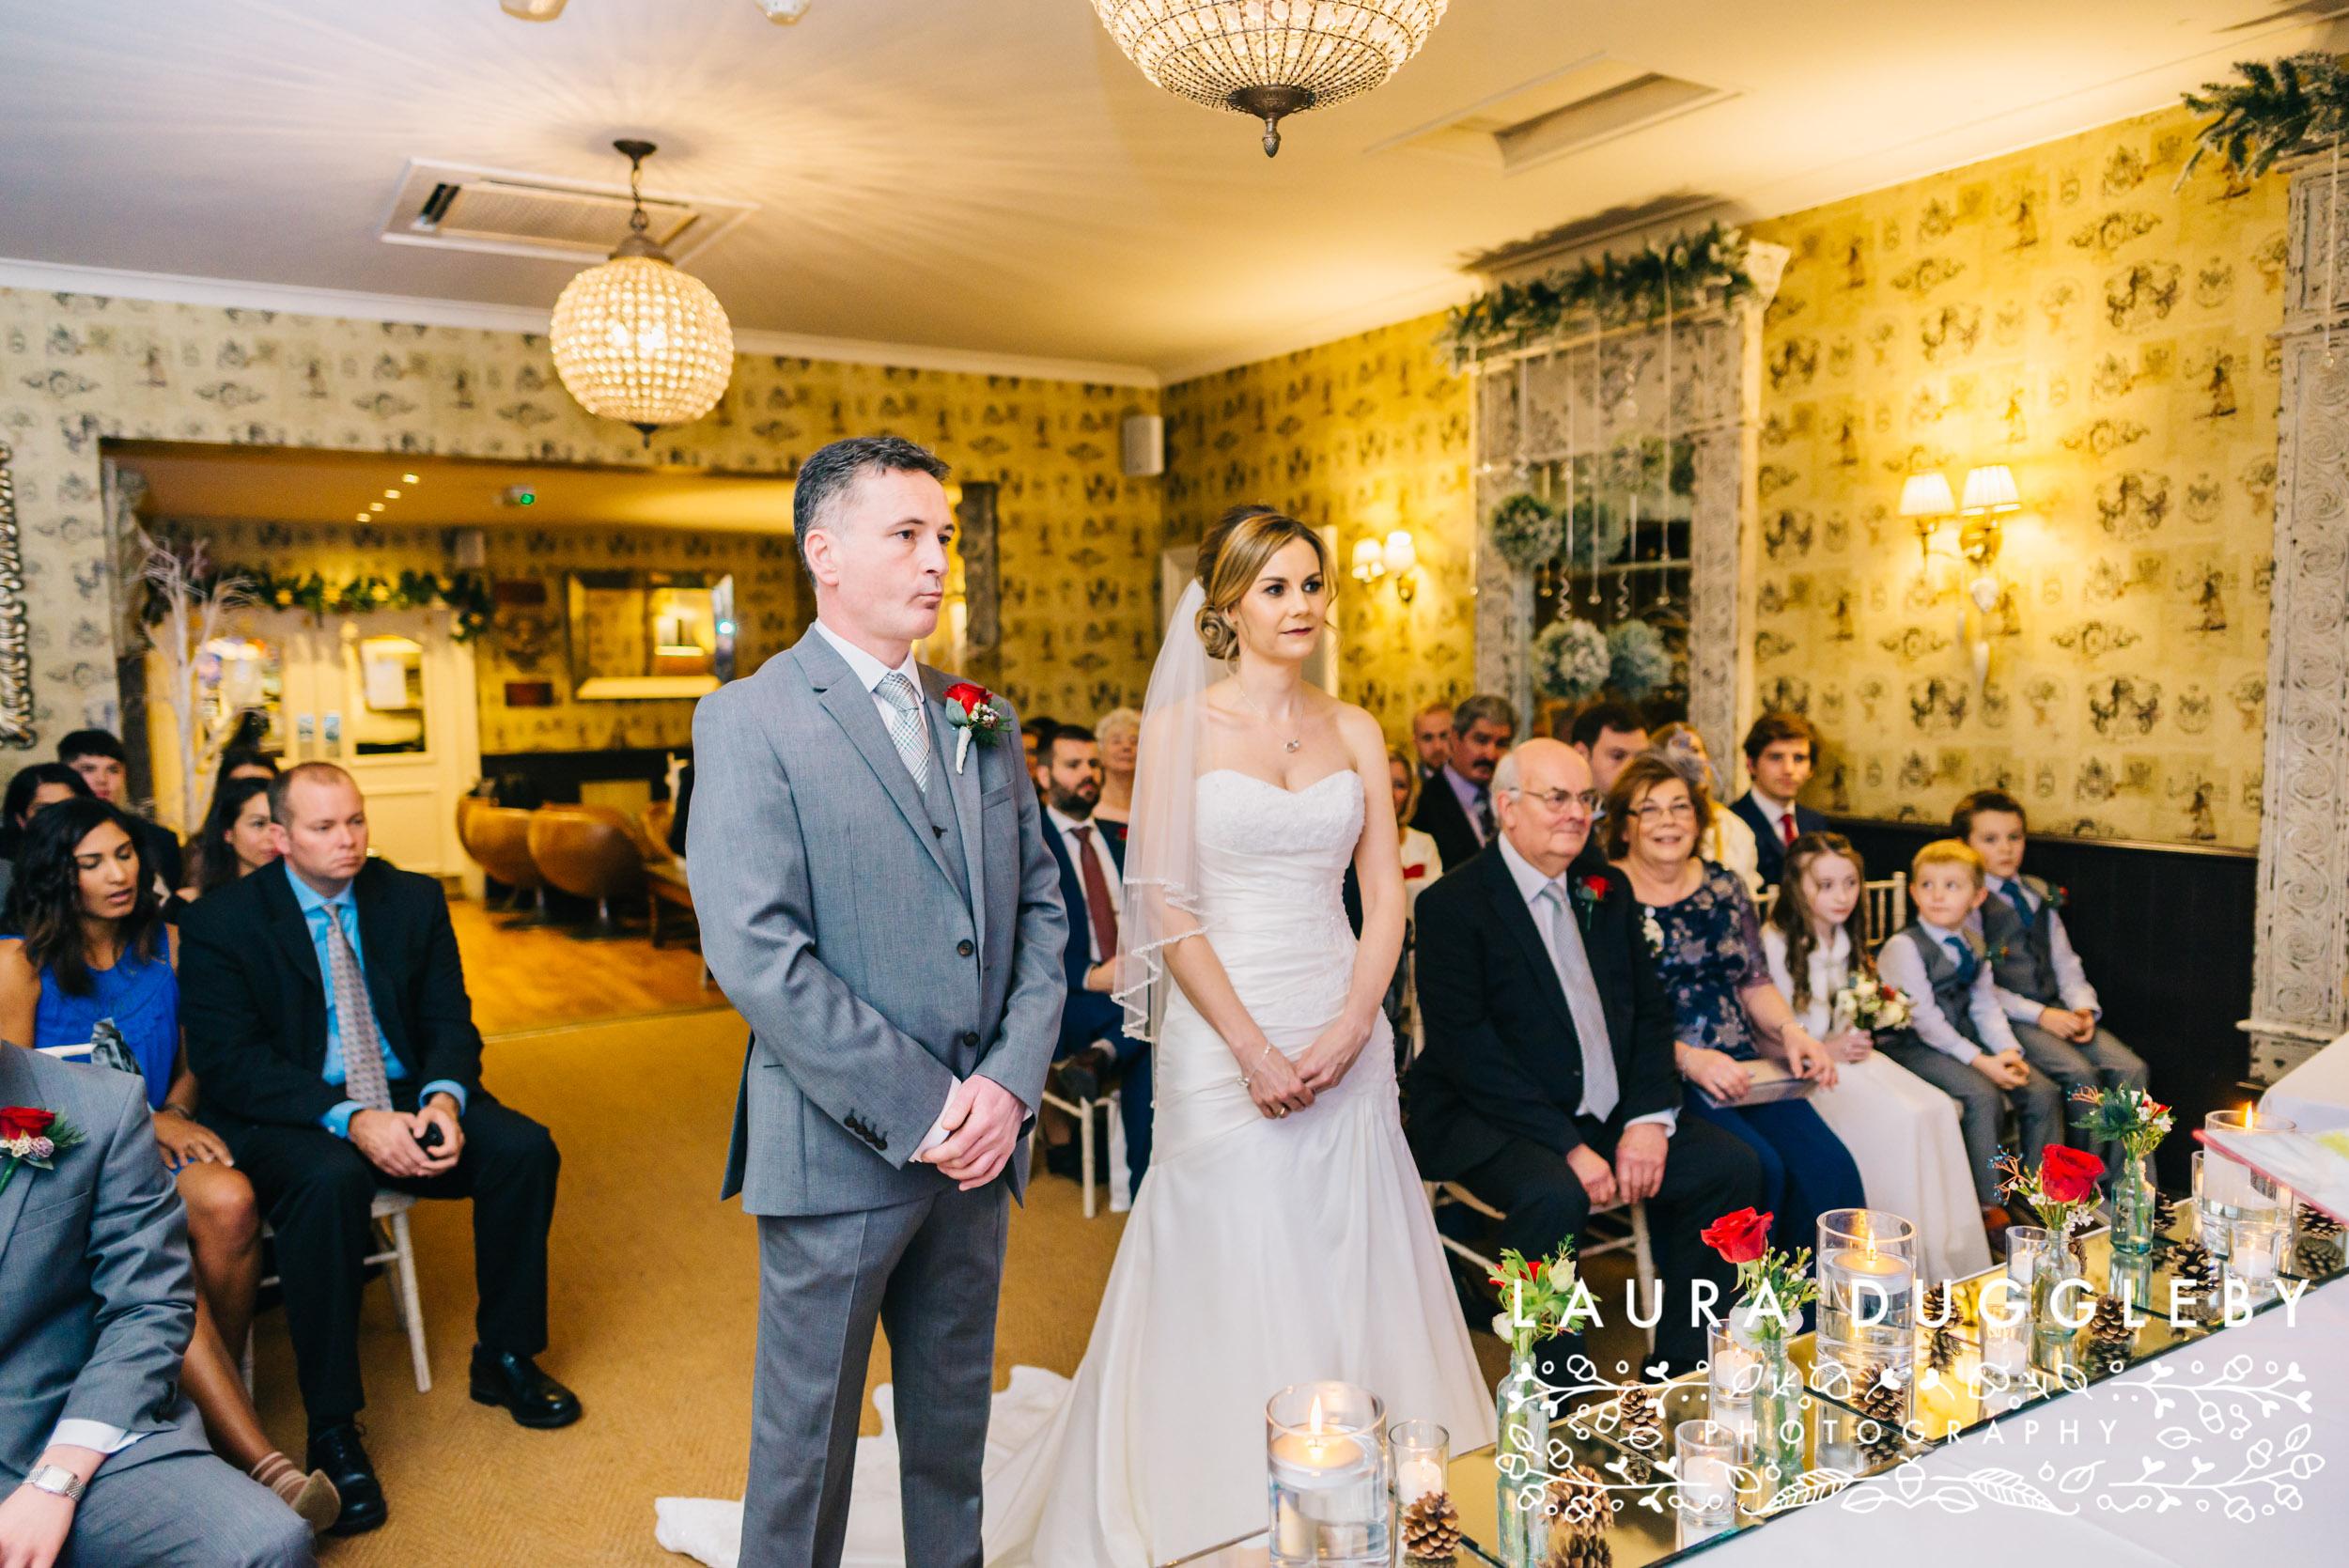 Wedding Ceremony At Shireburn Arms